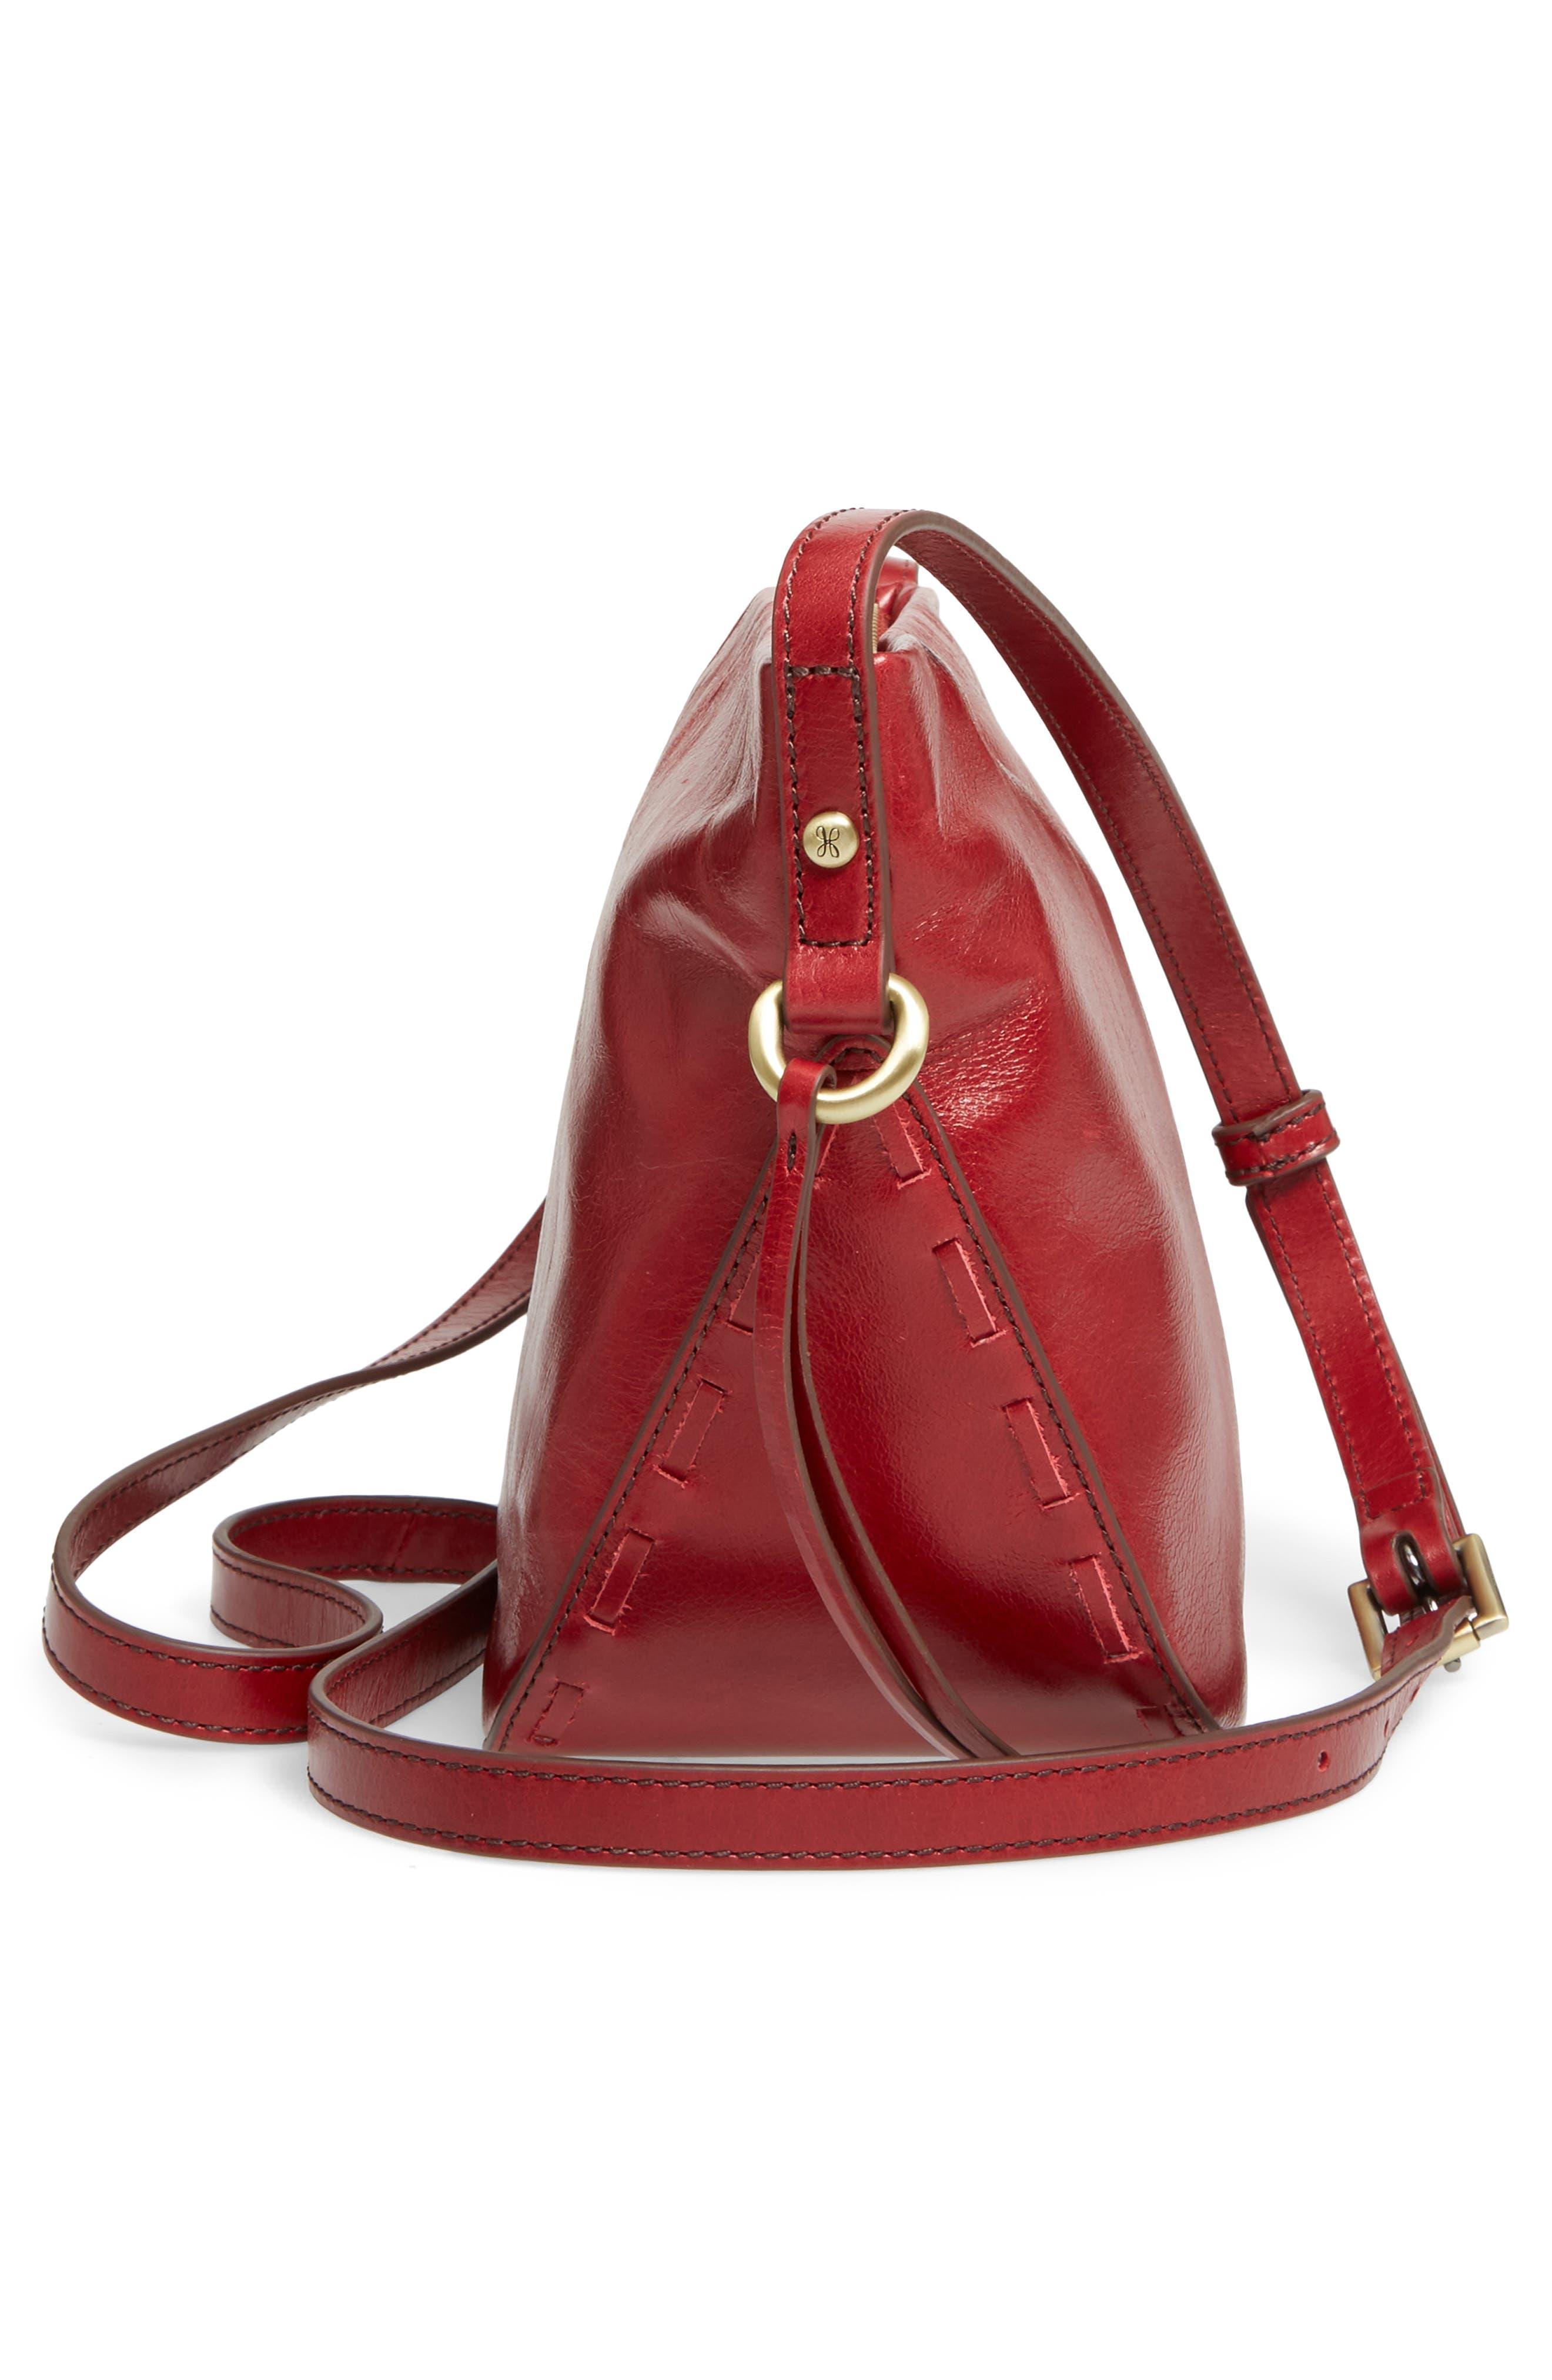 Muse Calfskin Leather Crossbody Bag,                             Alternate thumbnail 5, color,                             Cardinal